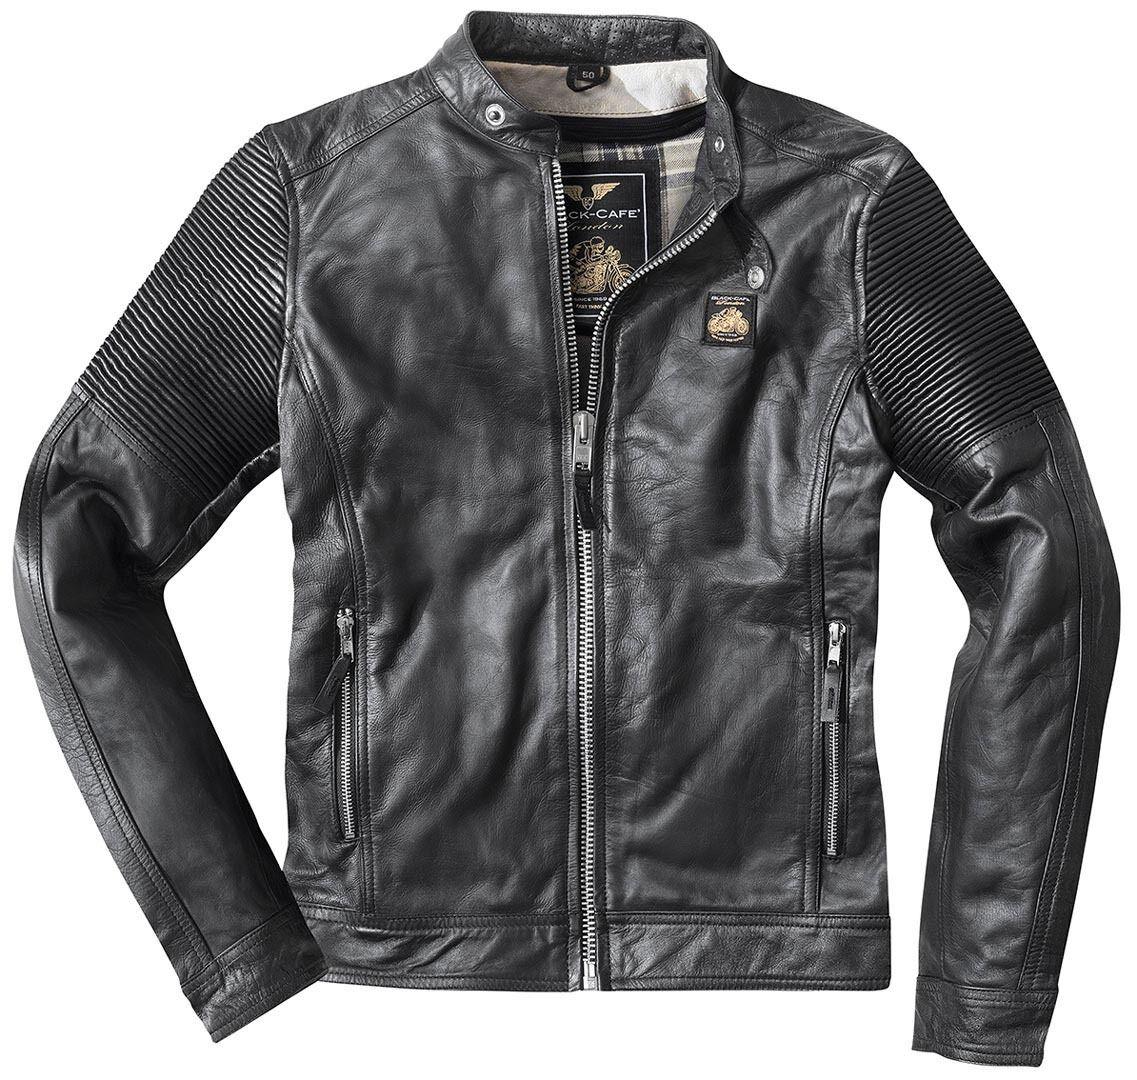 Black-Cafe London Milano Veste en cuir de moto Noir taille : 50